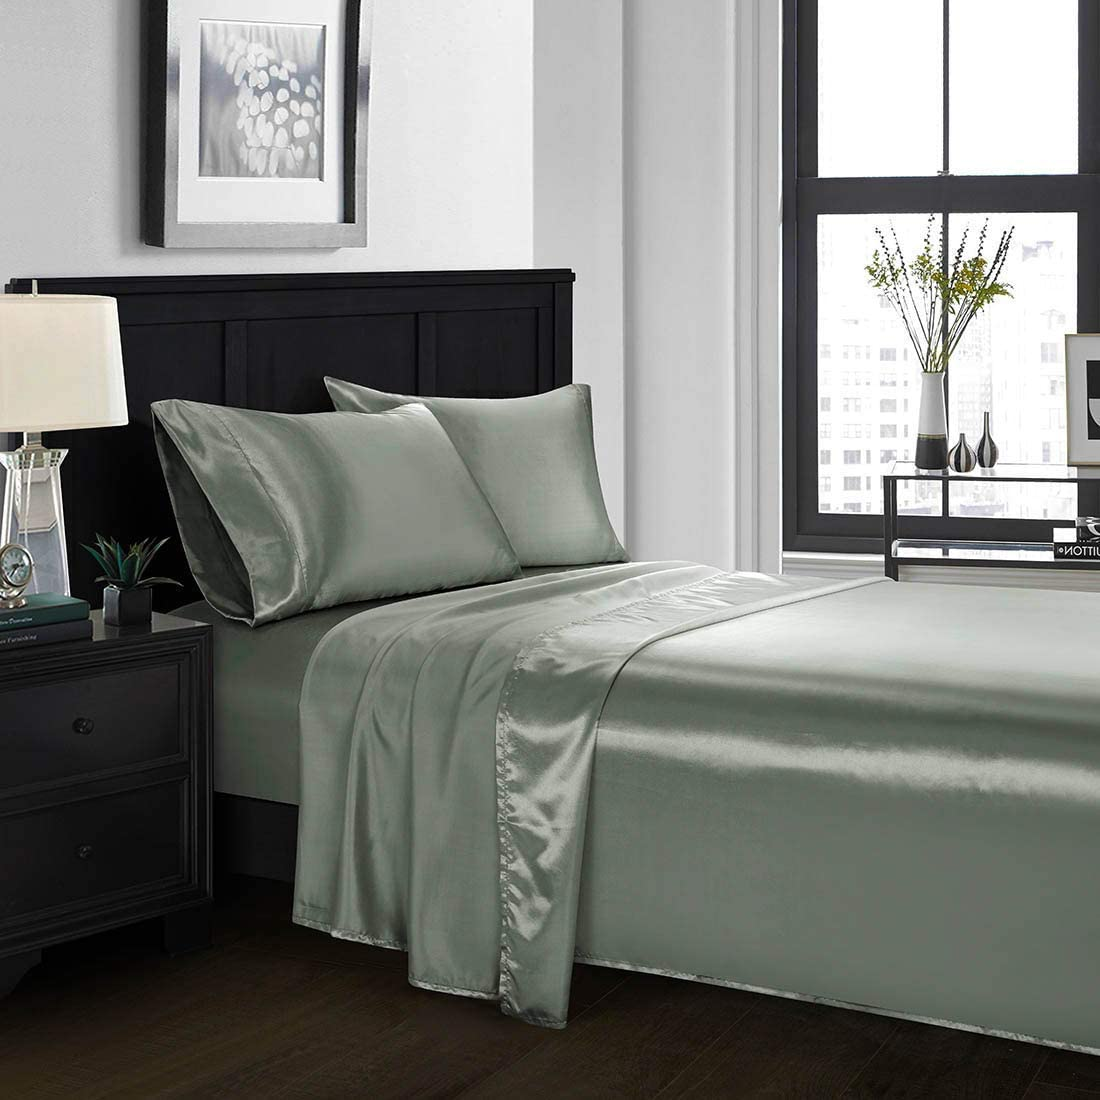 KBC linen Satin Flat Sheet Twin [1-Piece Flat Sheet Only, Dark Grey] Hotel Luxury Silky Flat Bed Sheet - Extra Soft Silky Satin Flat Sheet/Top Sheet